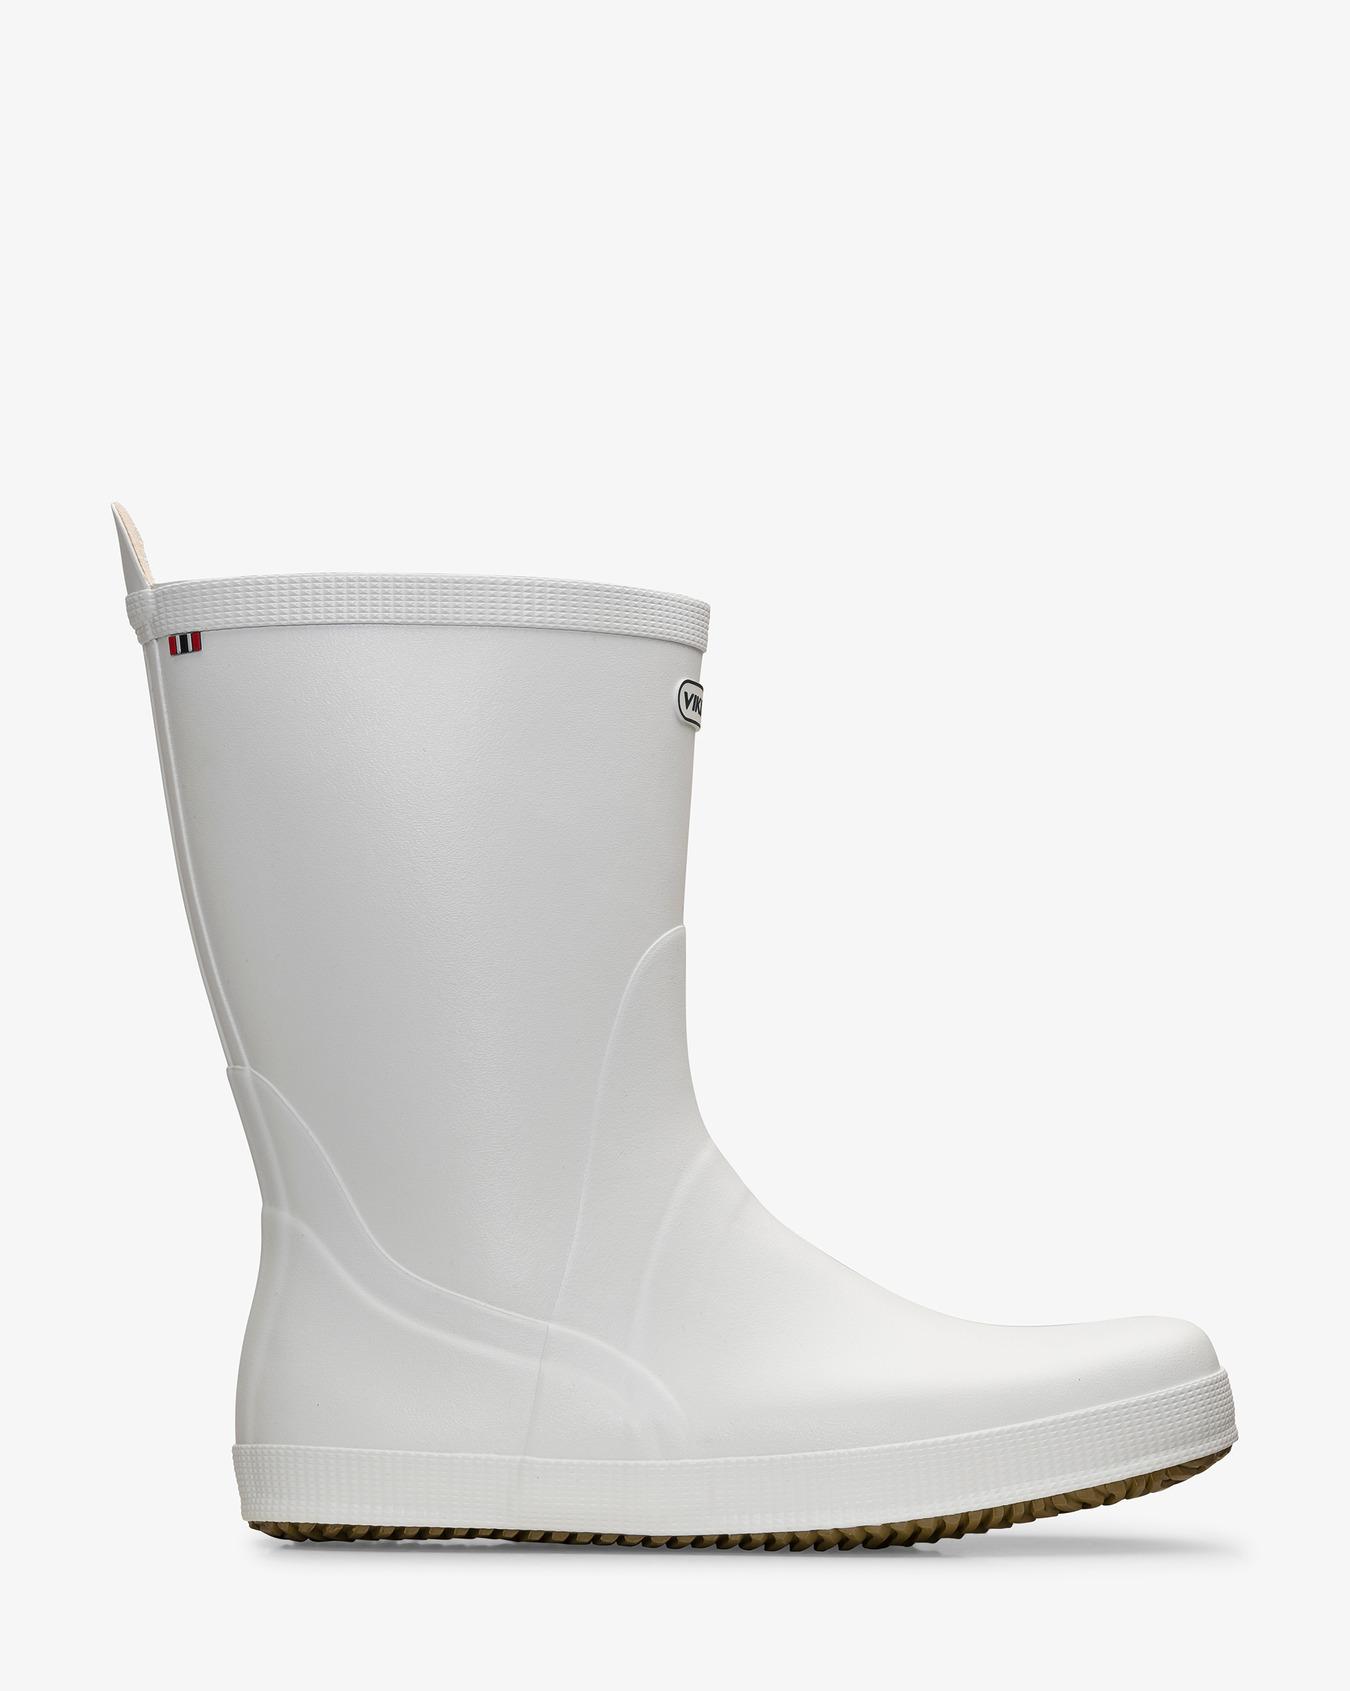 Seilas Rubber Boot